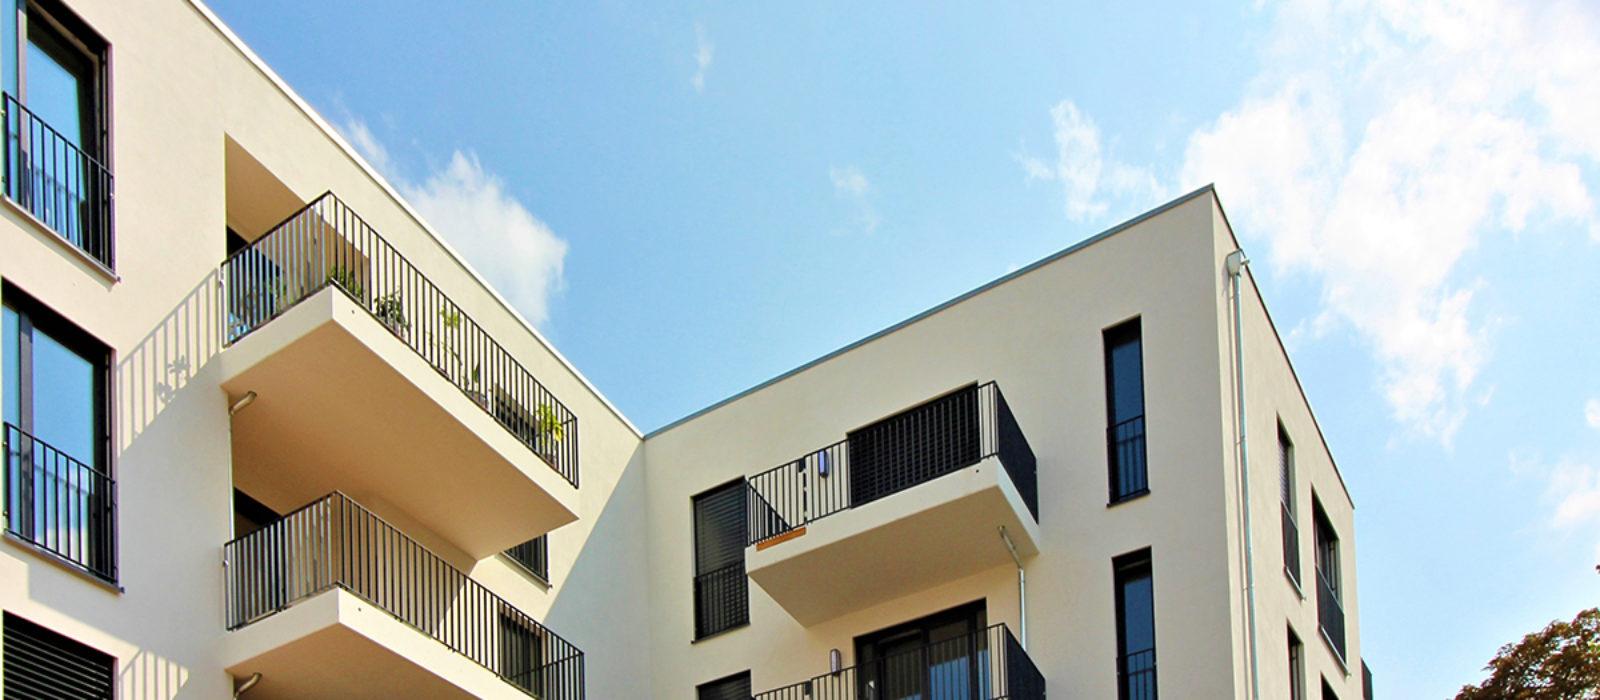 rendite starke kapitalanlage neubau immobilie